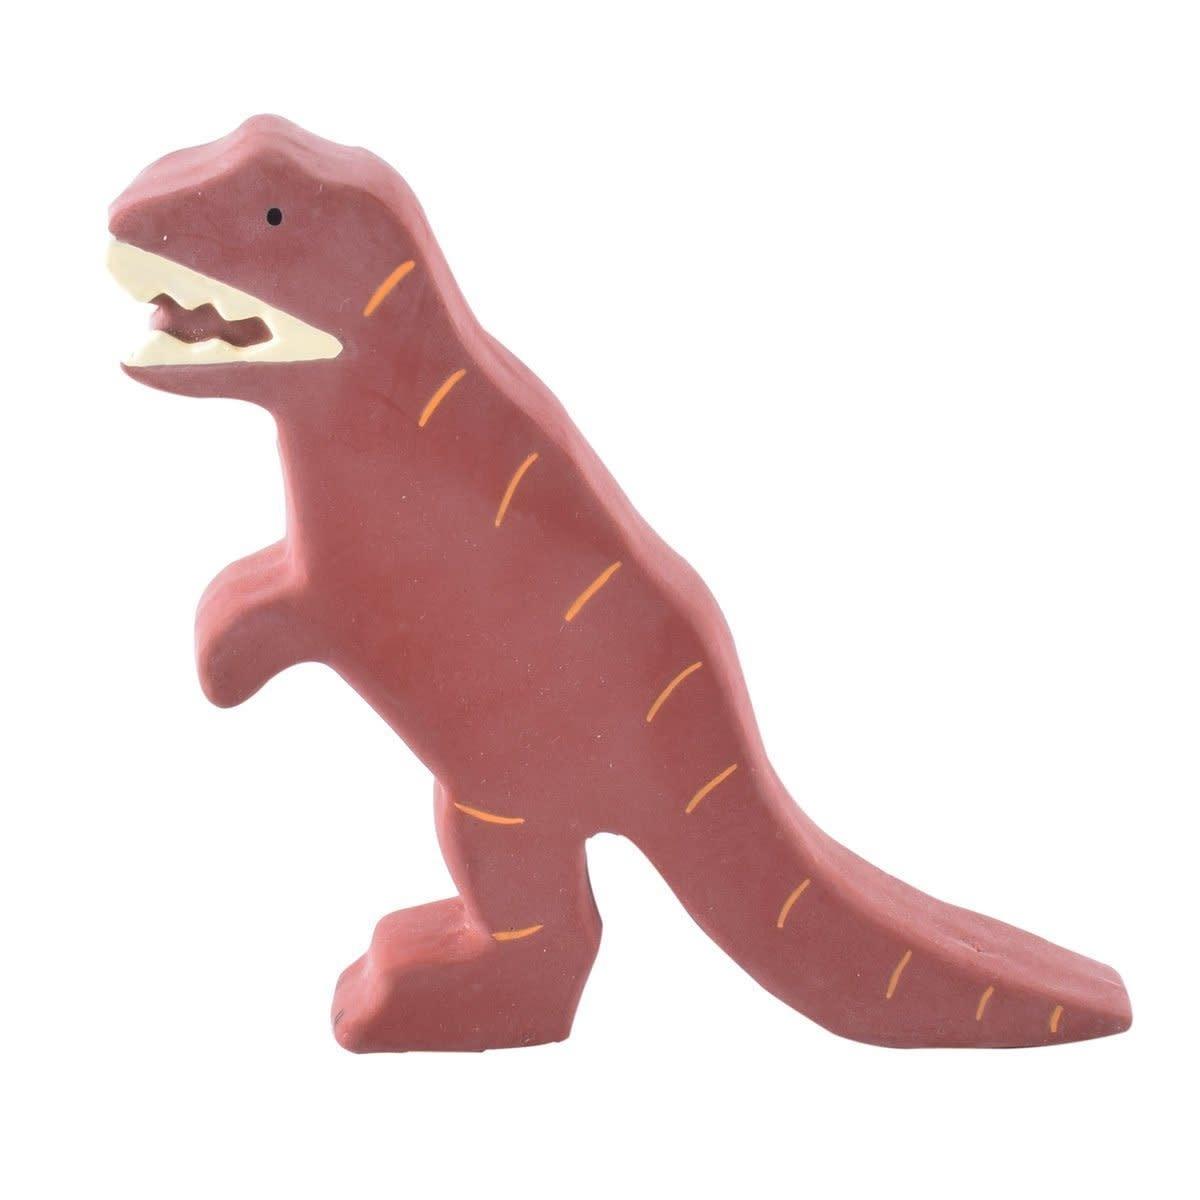 Tikiri Baby Rubber Toy